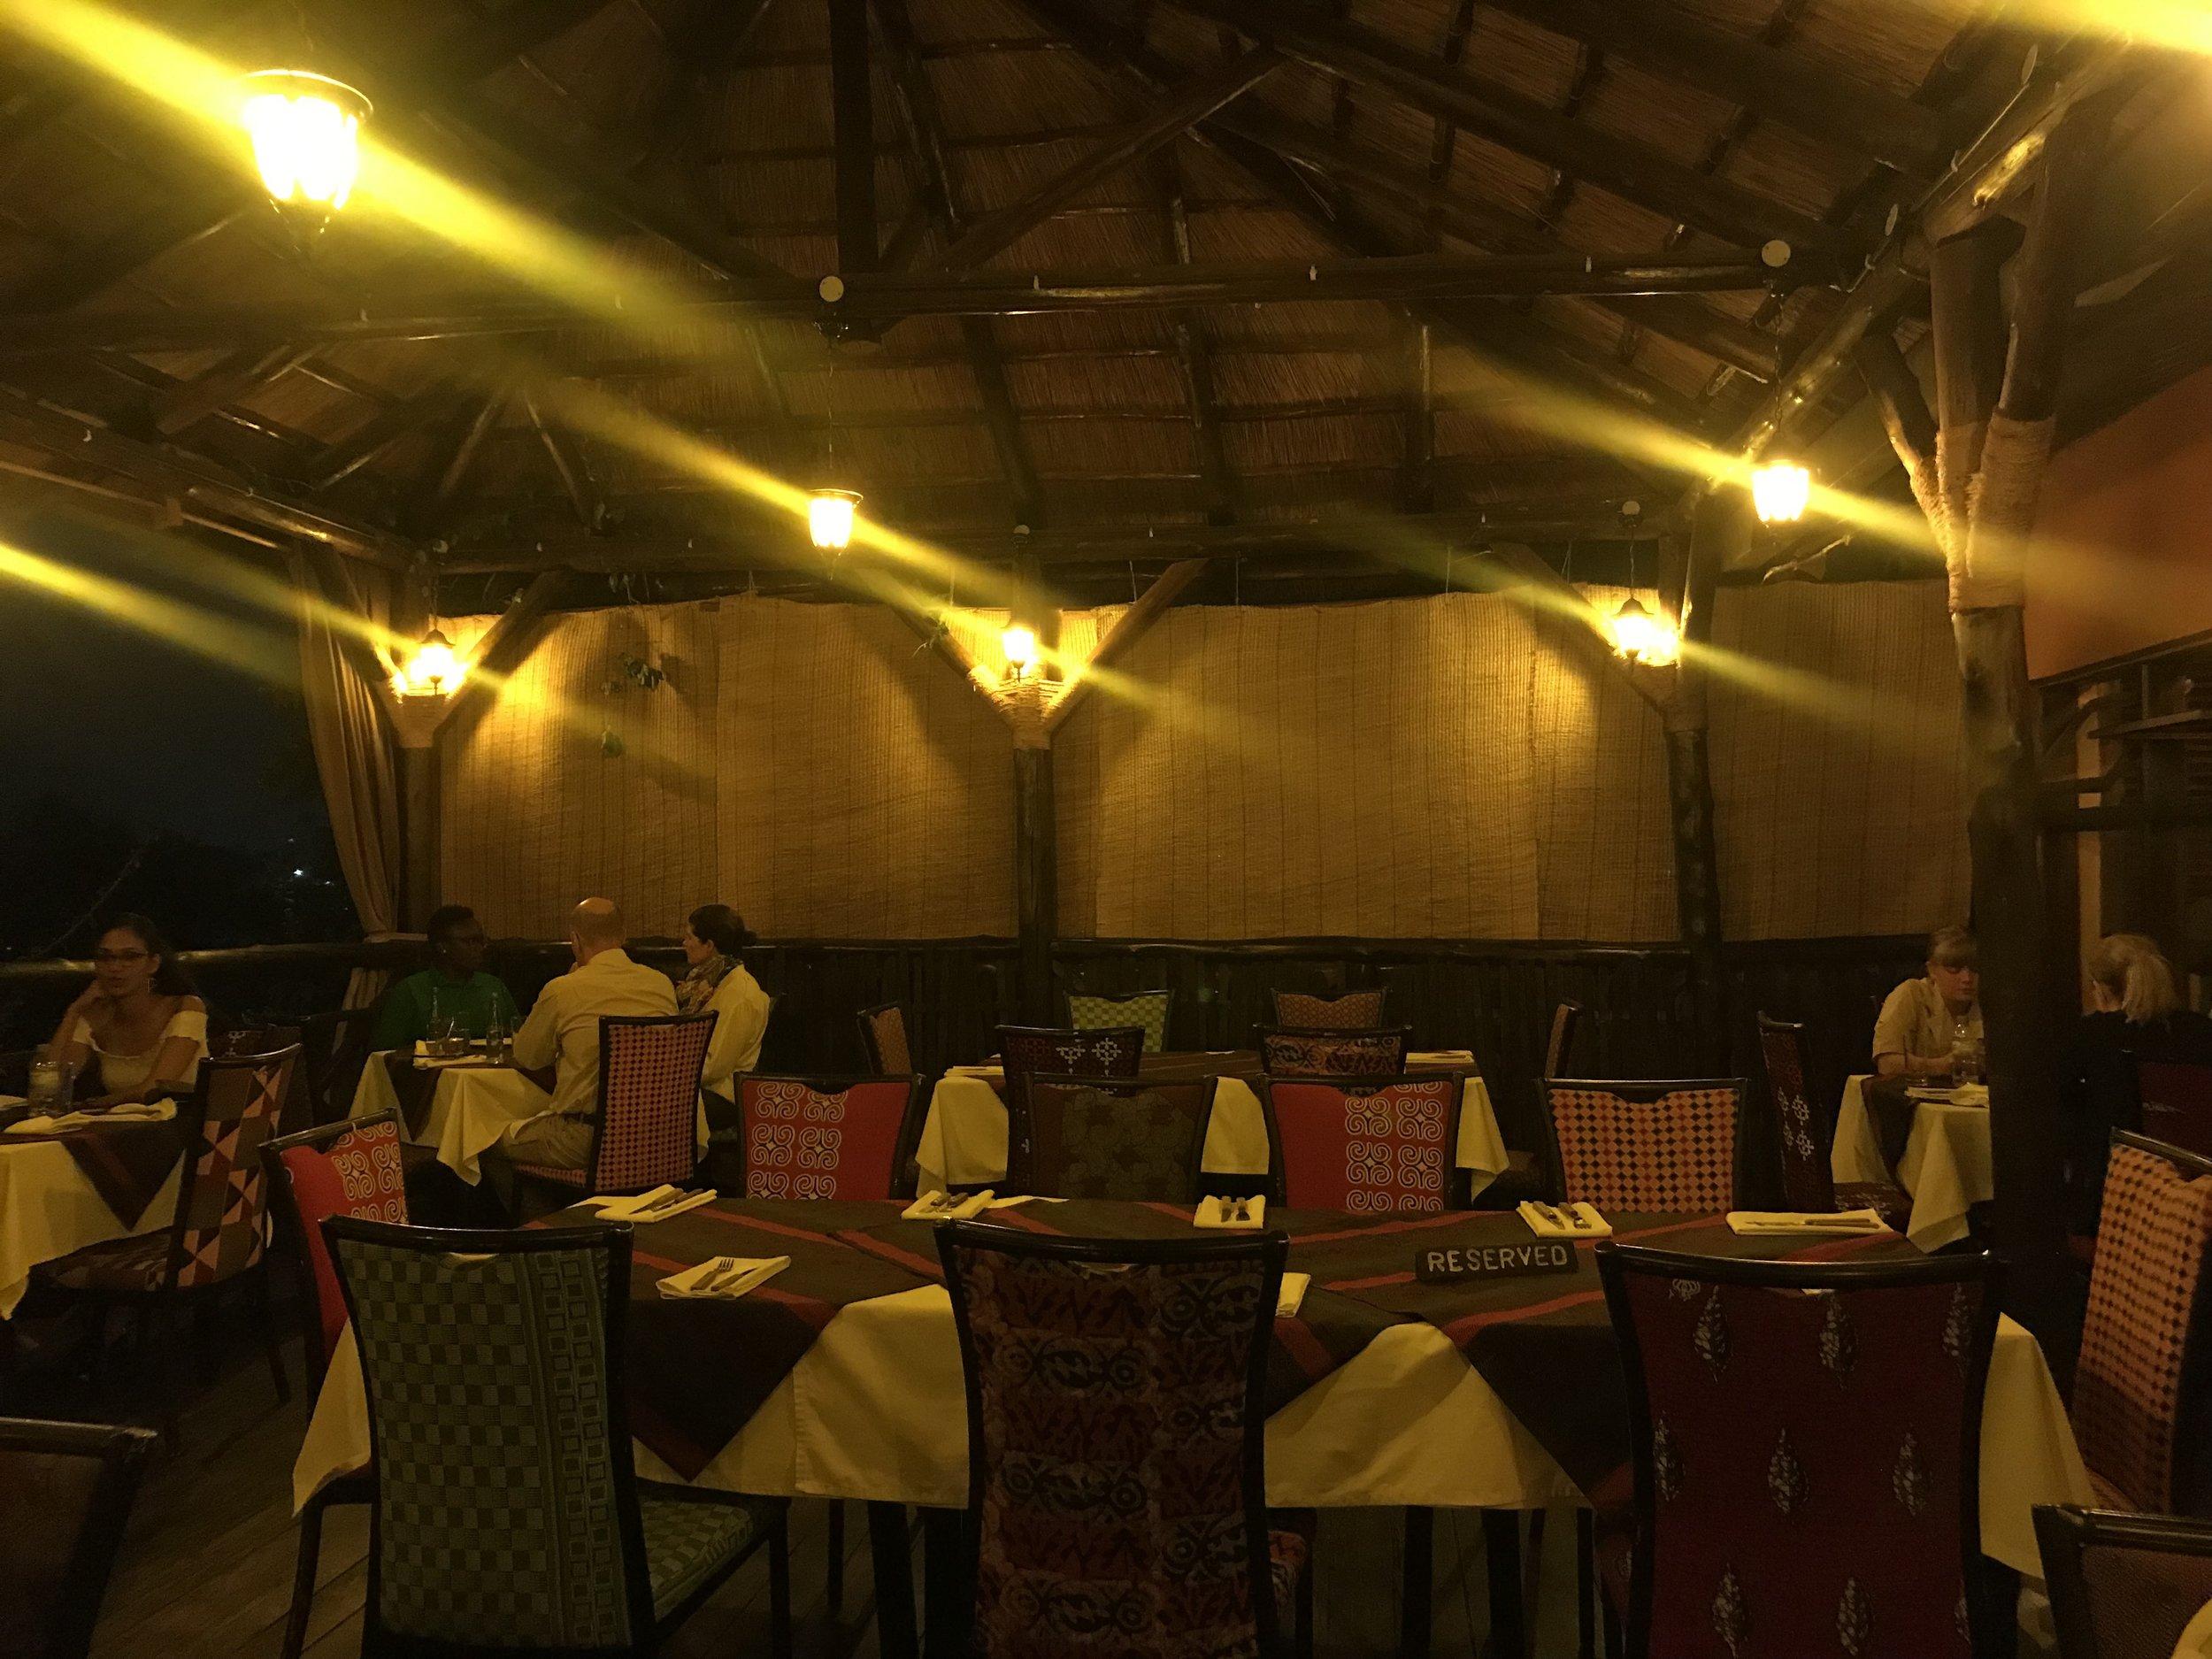 IMG_6236VickieRemoe-travel-kigali-rwanda-review-kwibohora25-hotels-africa.JPG